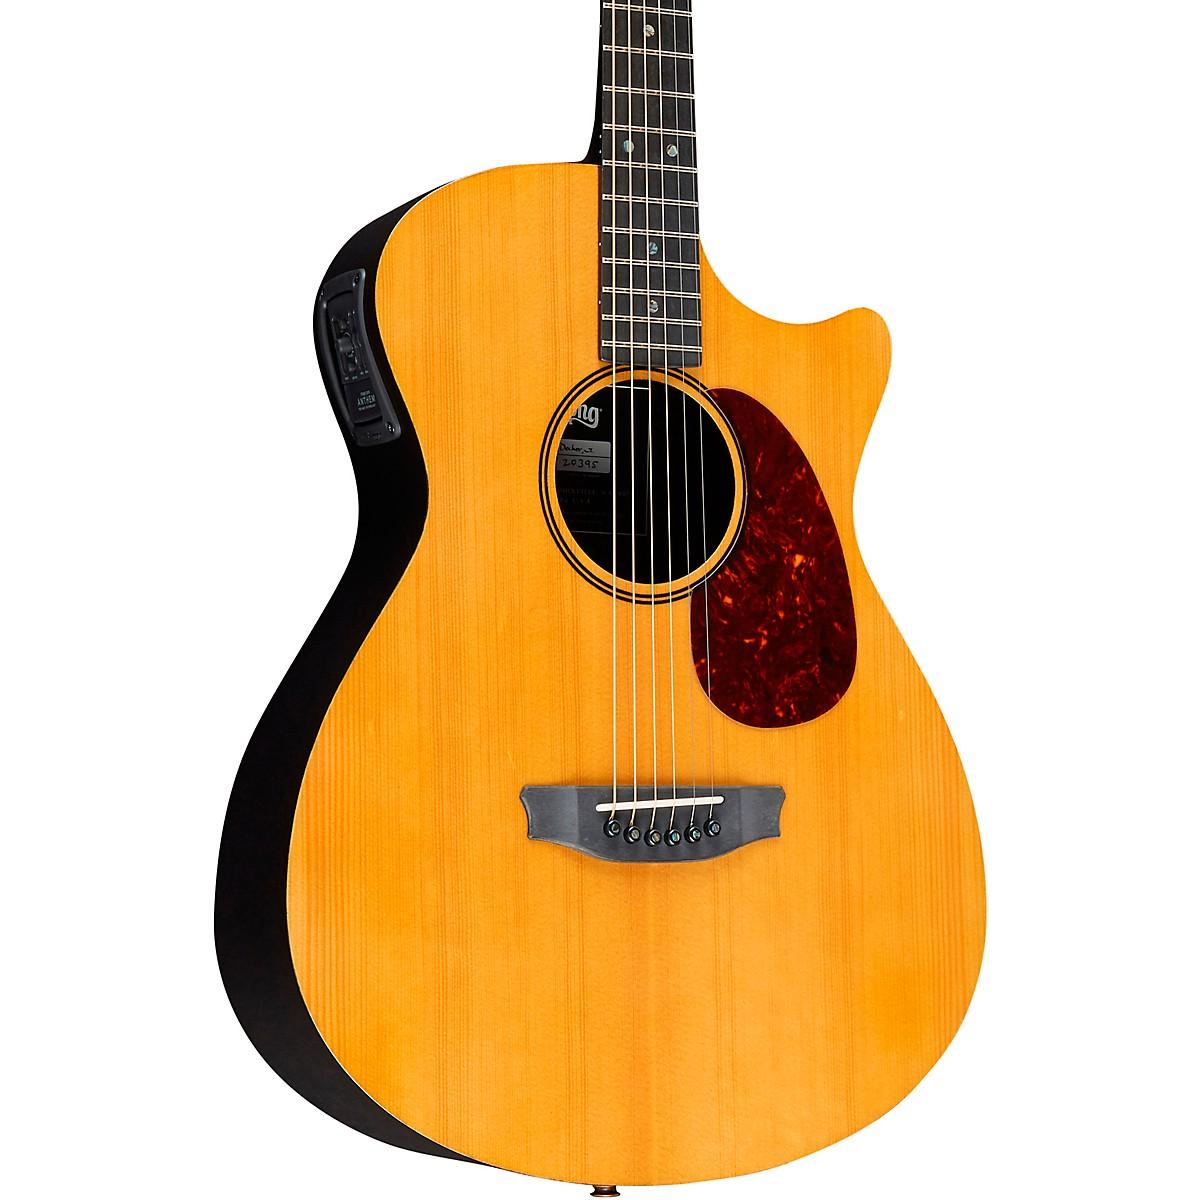 Rainsong Vintage Series OM Acoustic-Electric Guitar